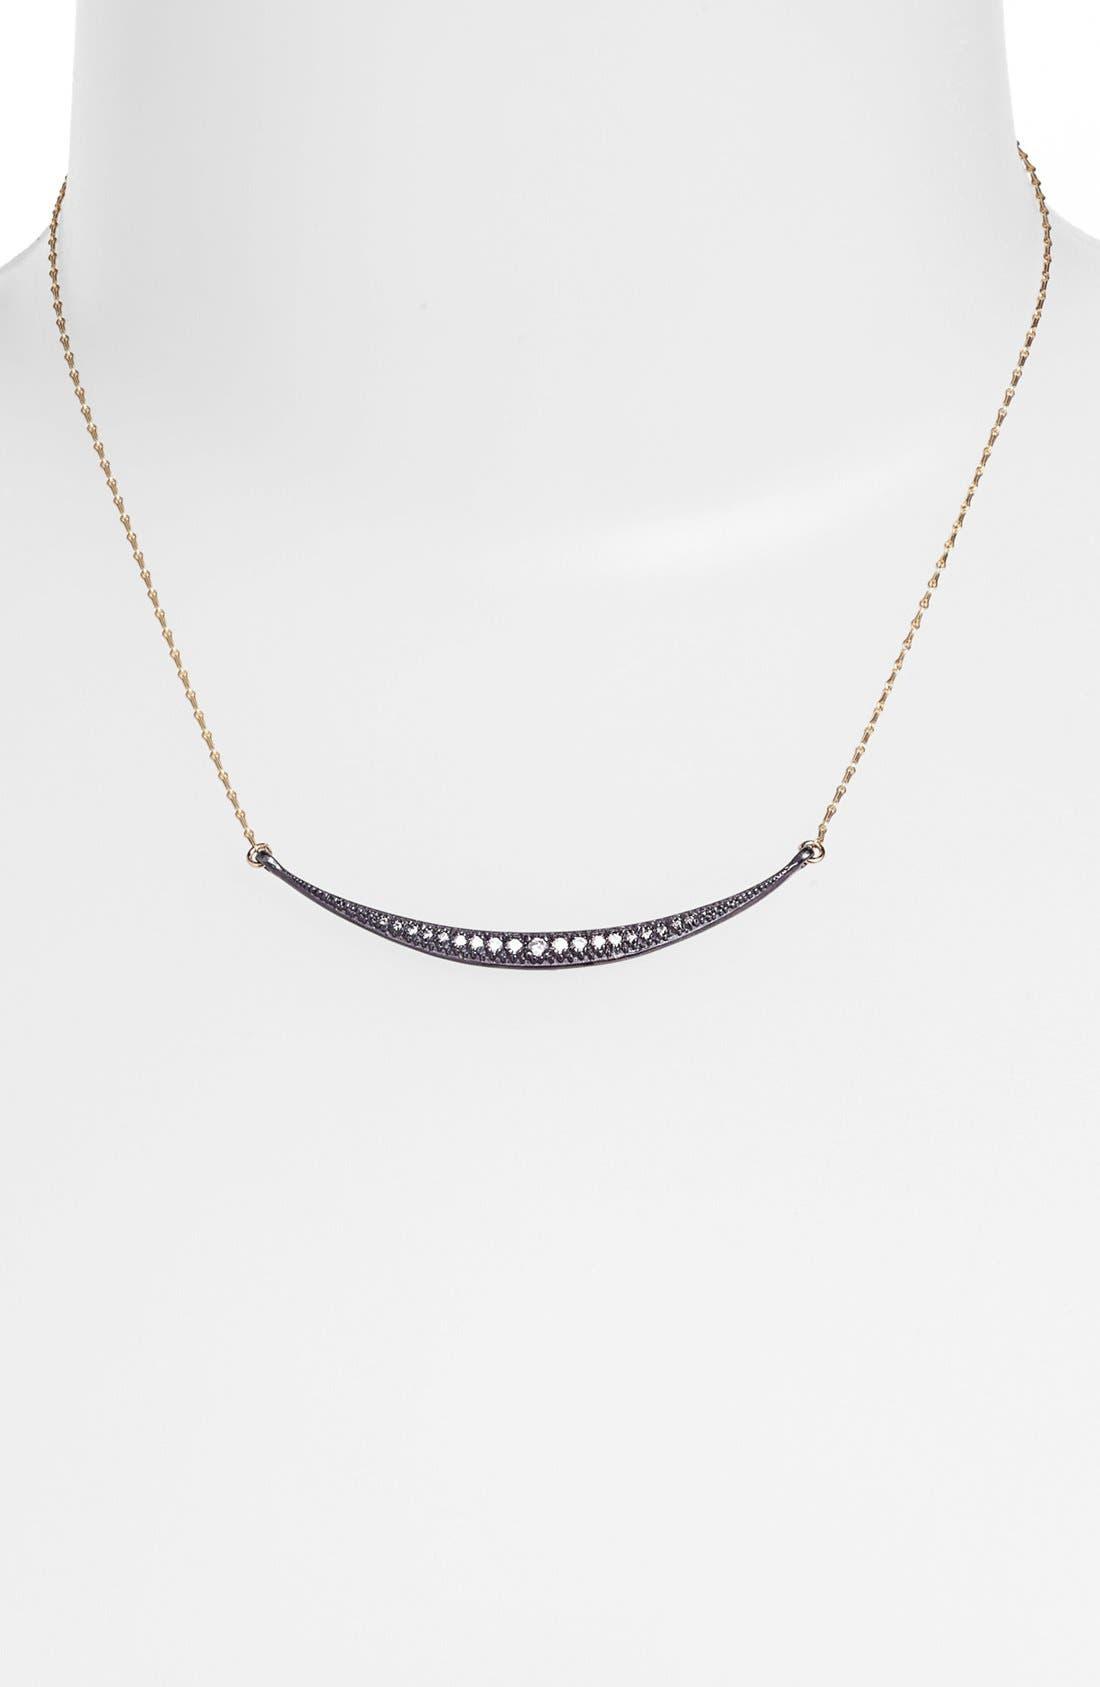 Main Image - Mizuki 'Icicles' Diamond Crescent Pendant Necklace